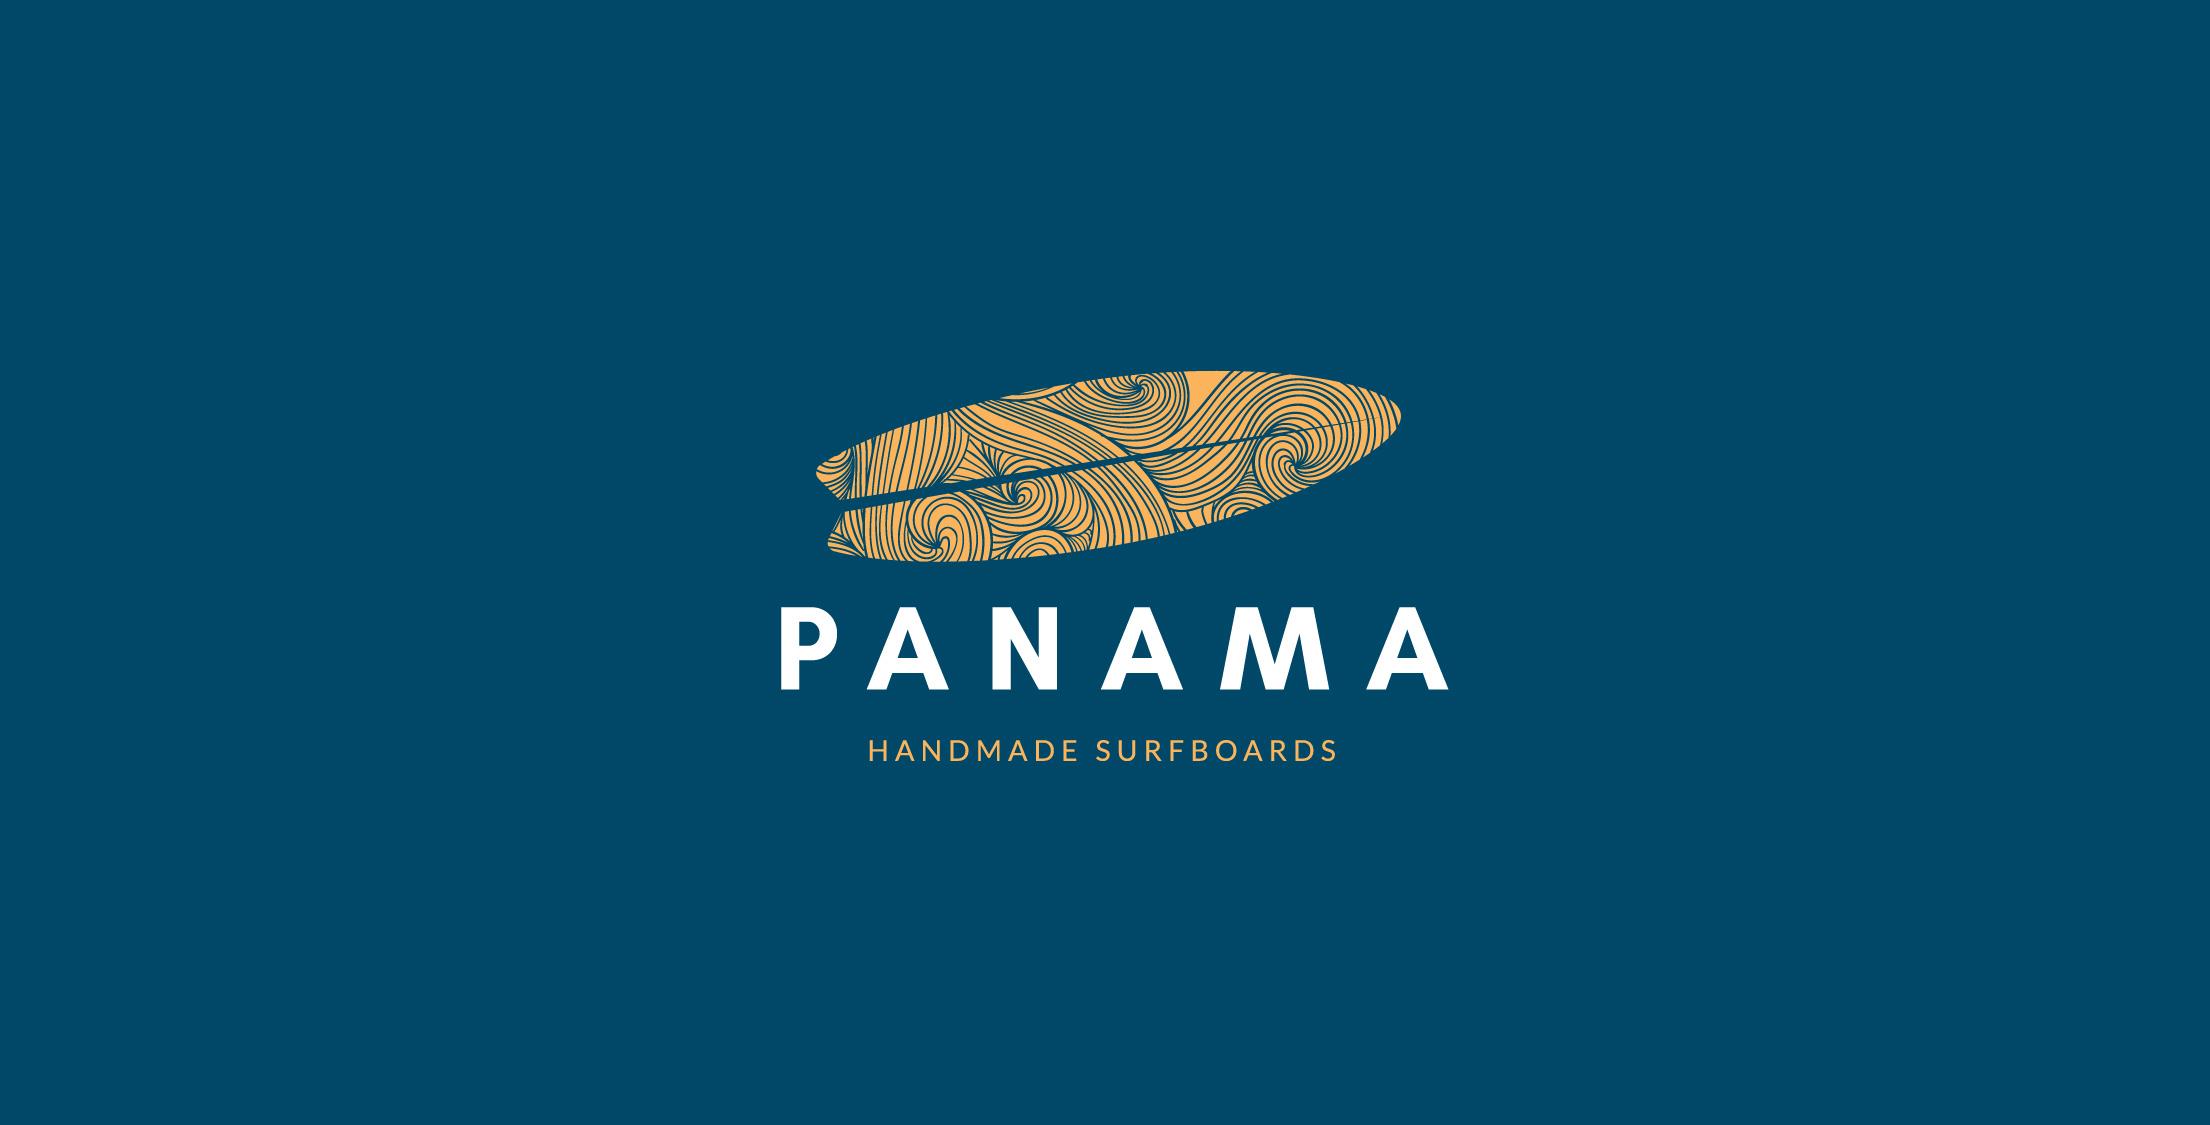 panama_logo